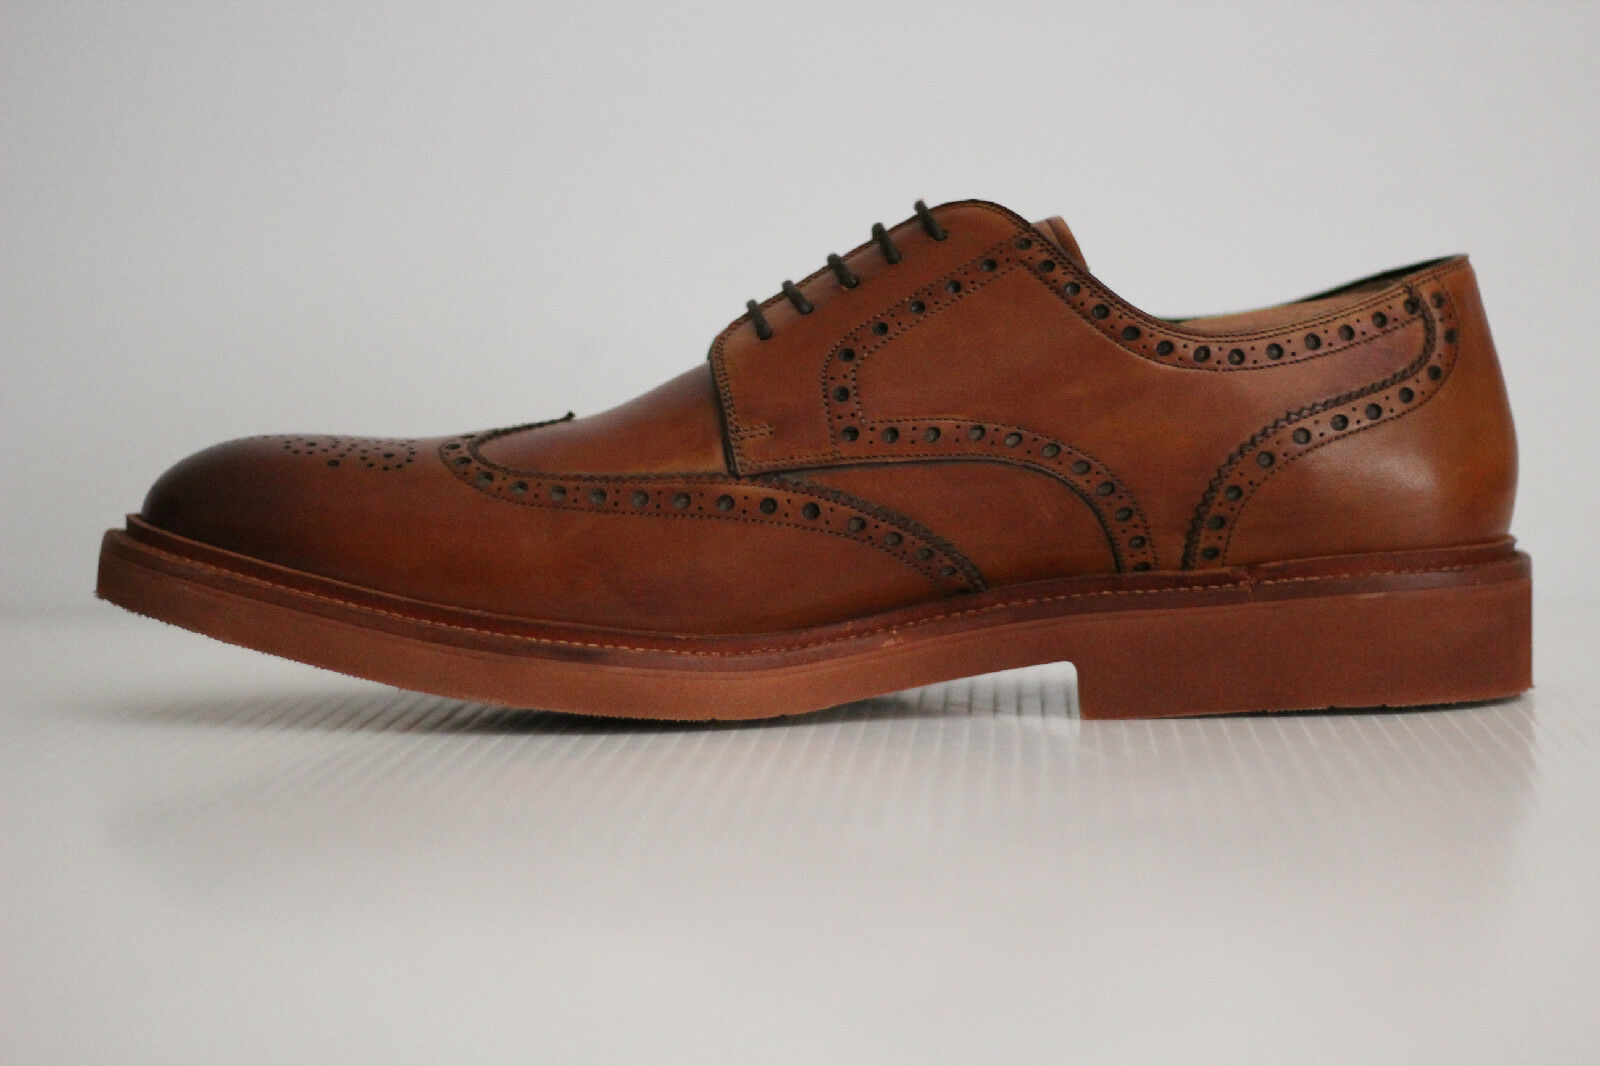 NEW Magnanni Neto Leather Lace Up Wingtip Brogue Derby - - - Cognac braun 13M (X71) b2e6ce